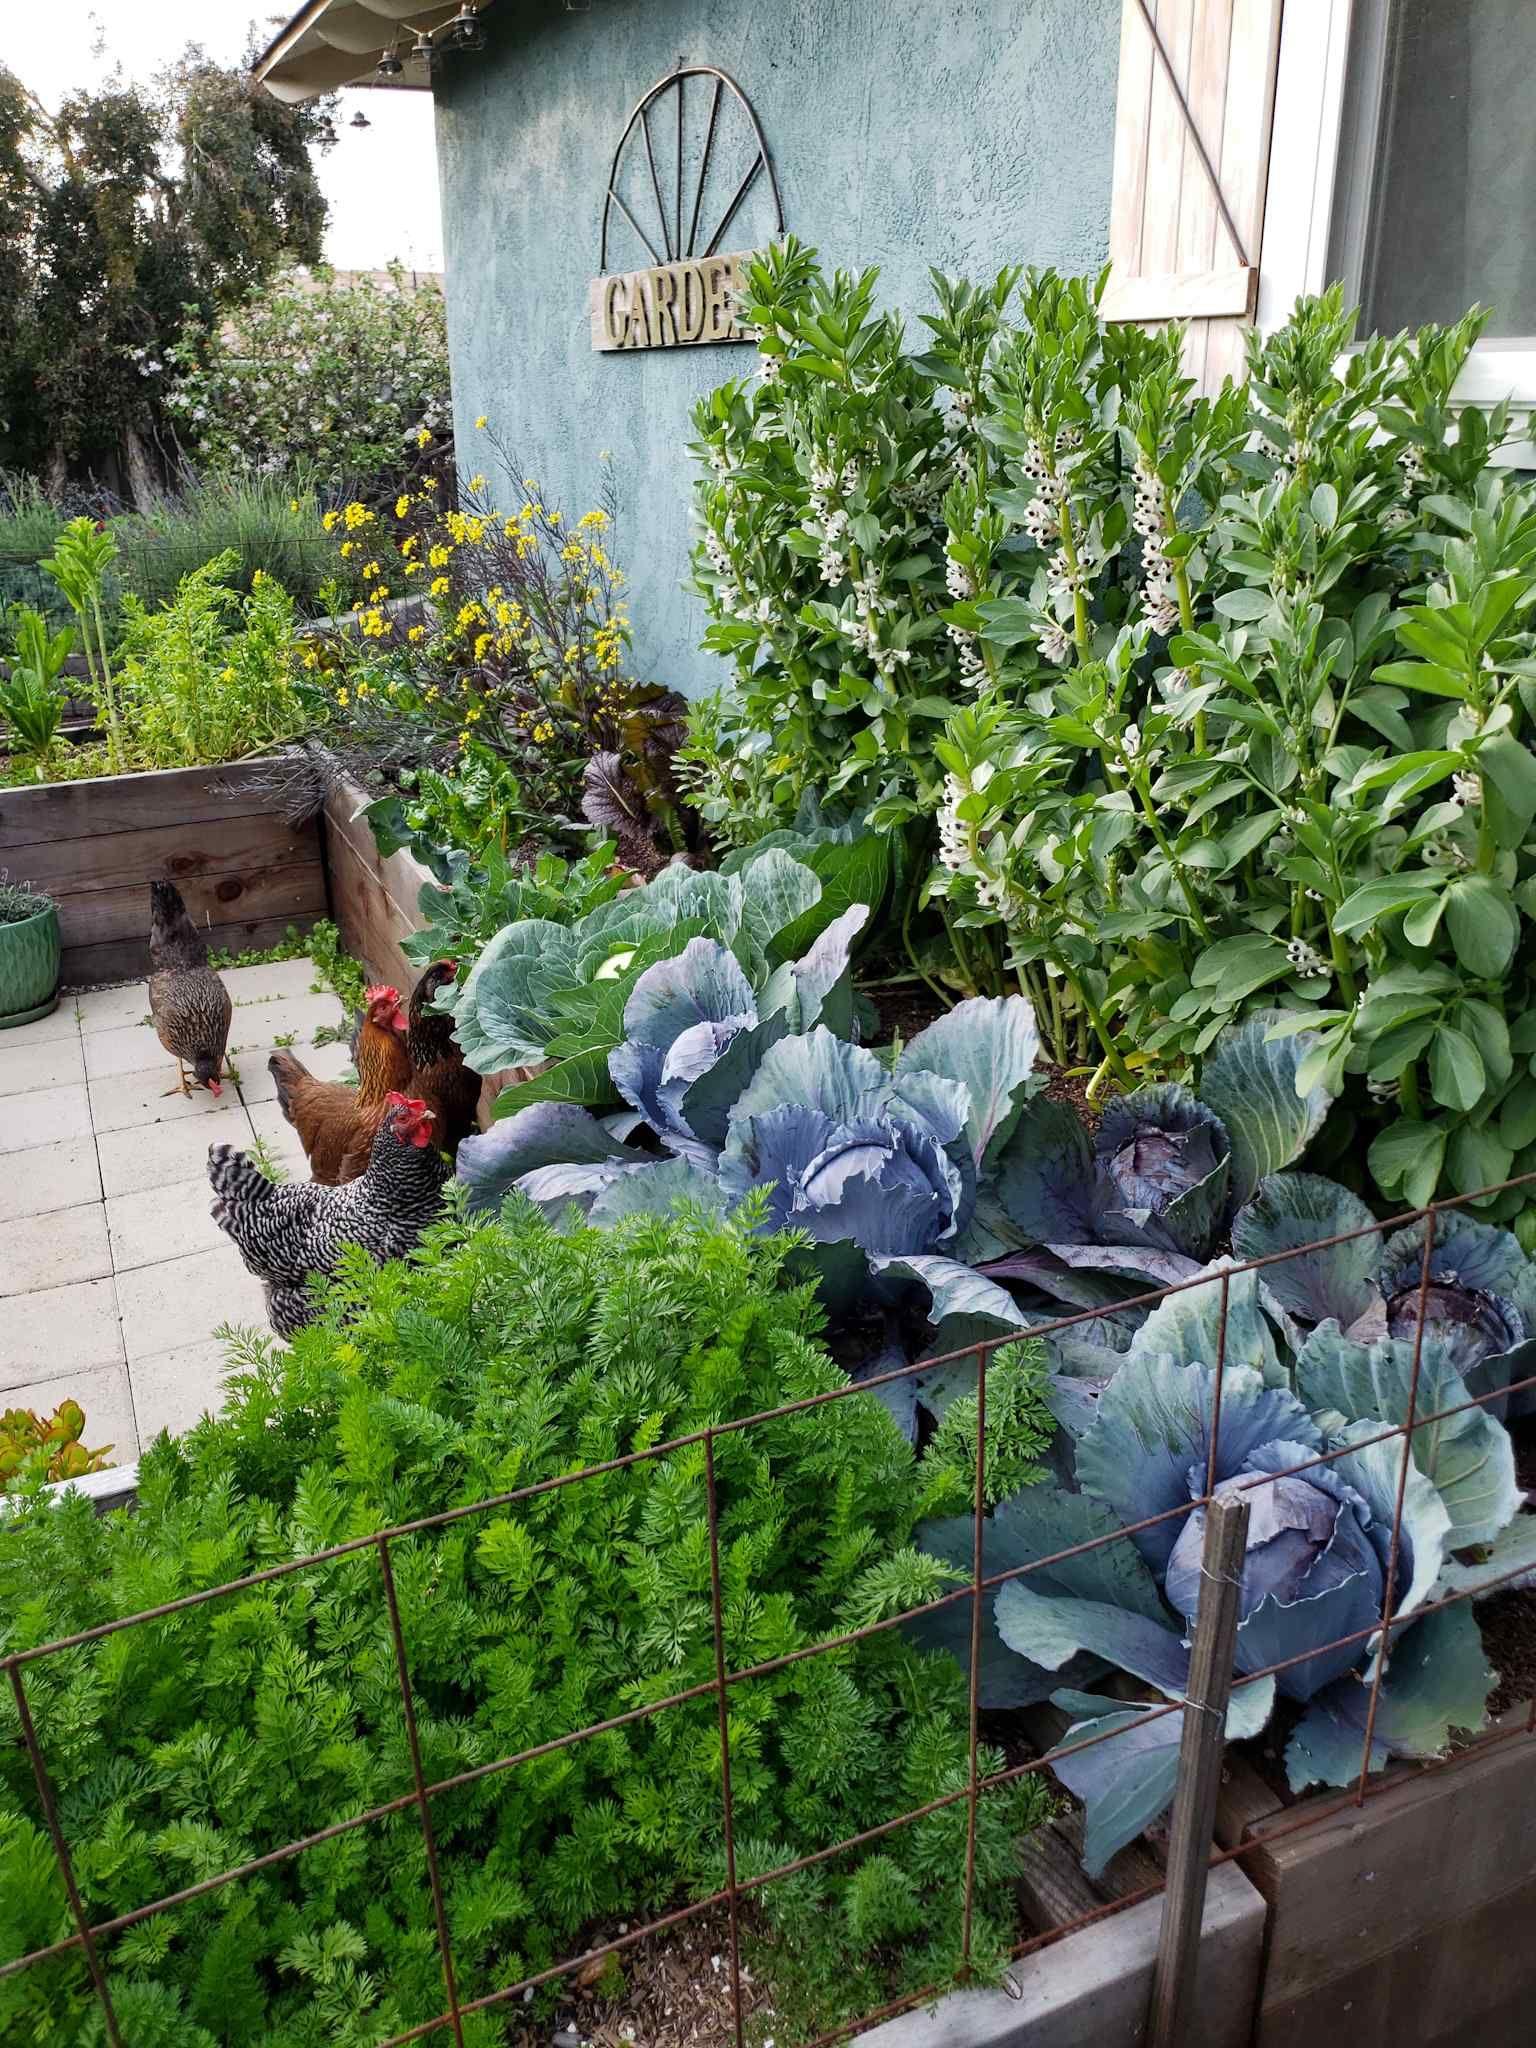 Former Oklahoma Gardening host Ray Campbell the